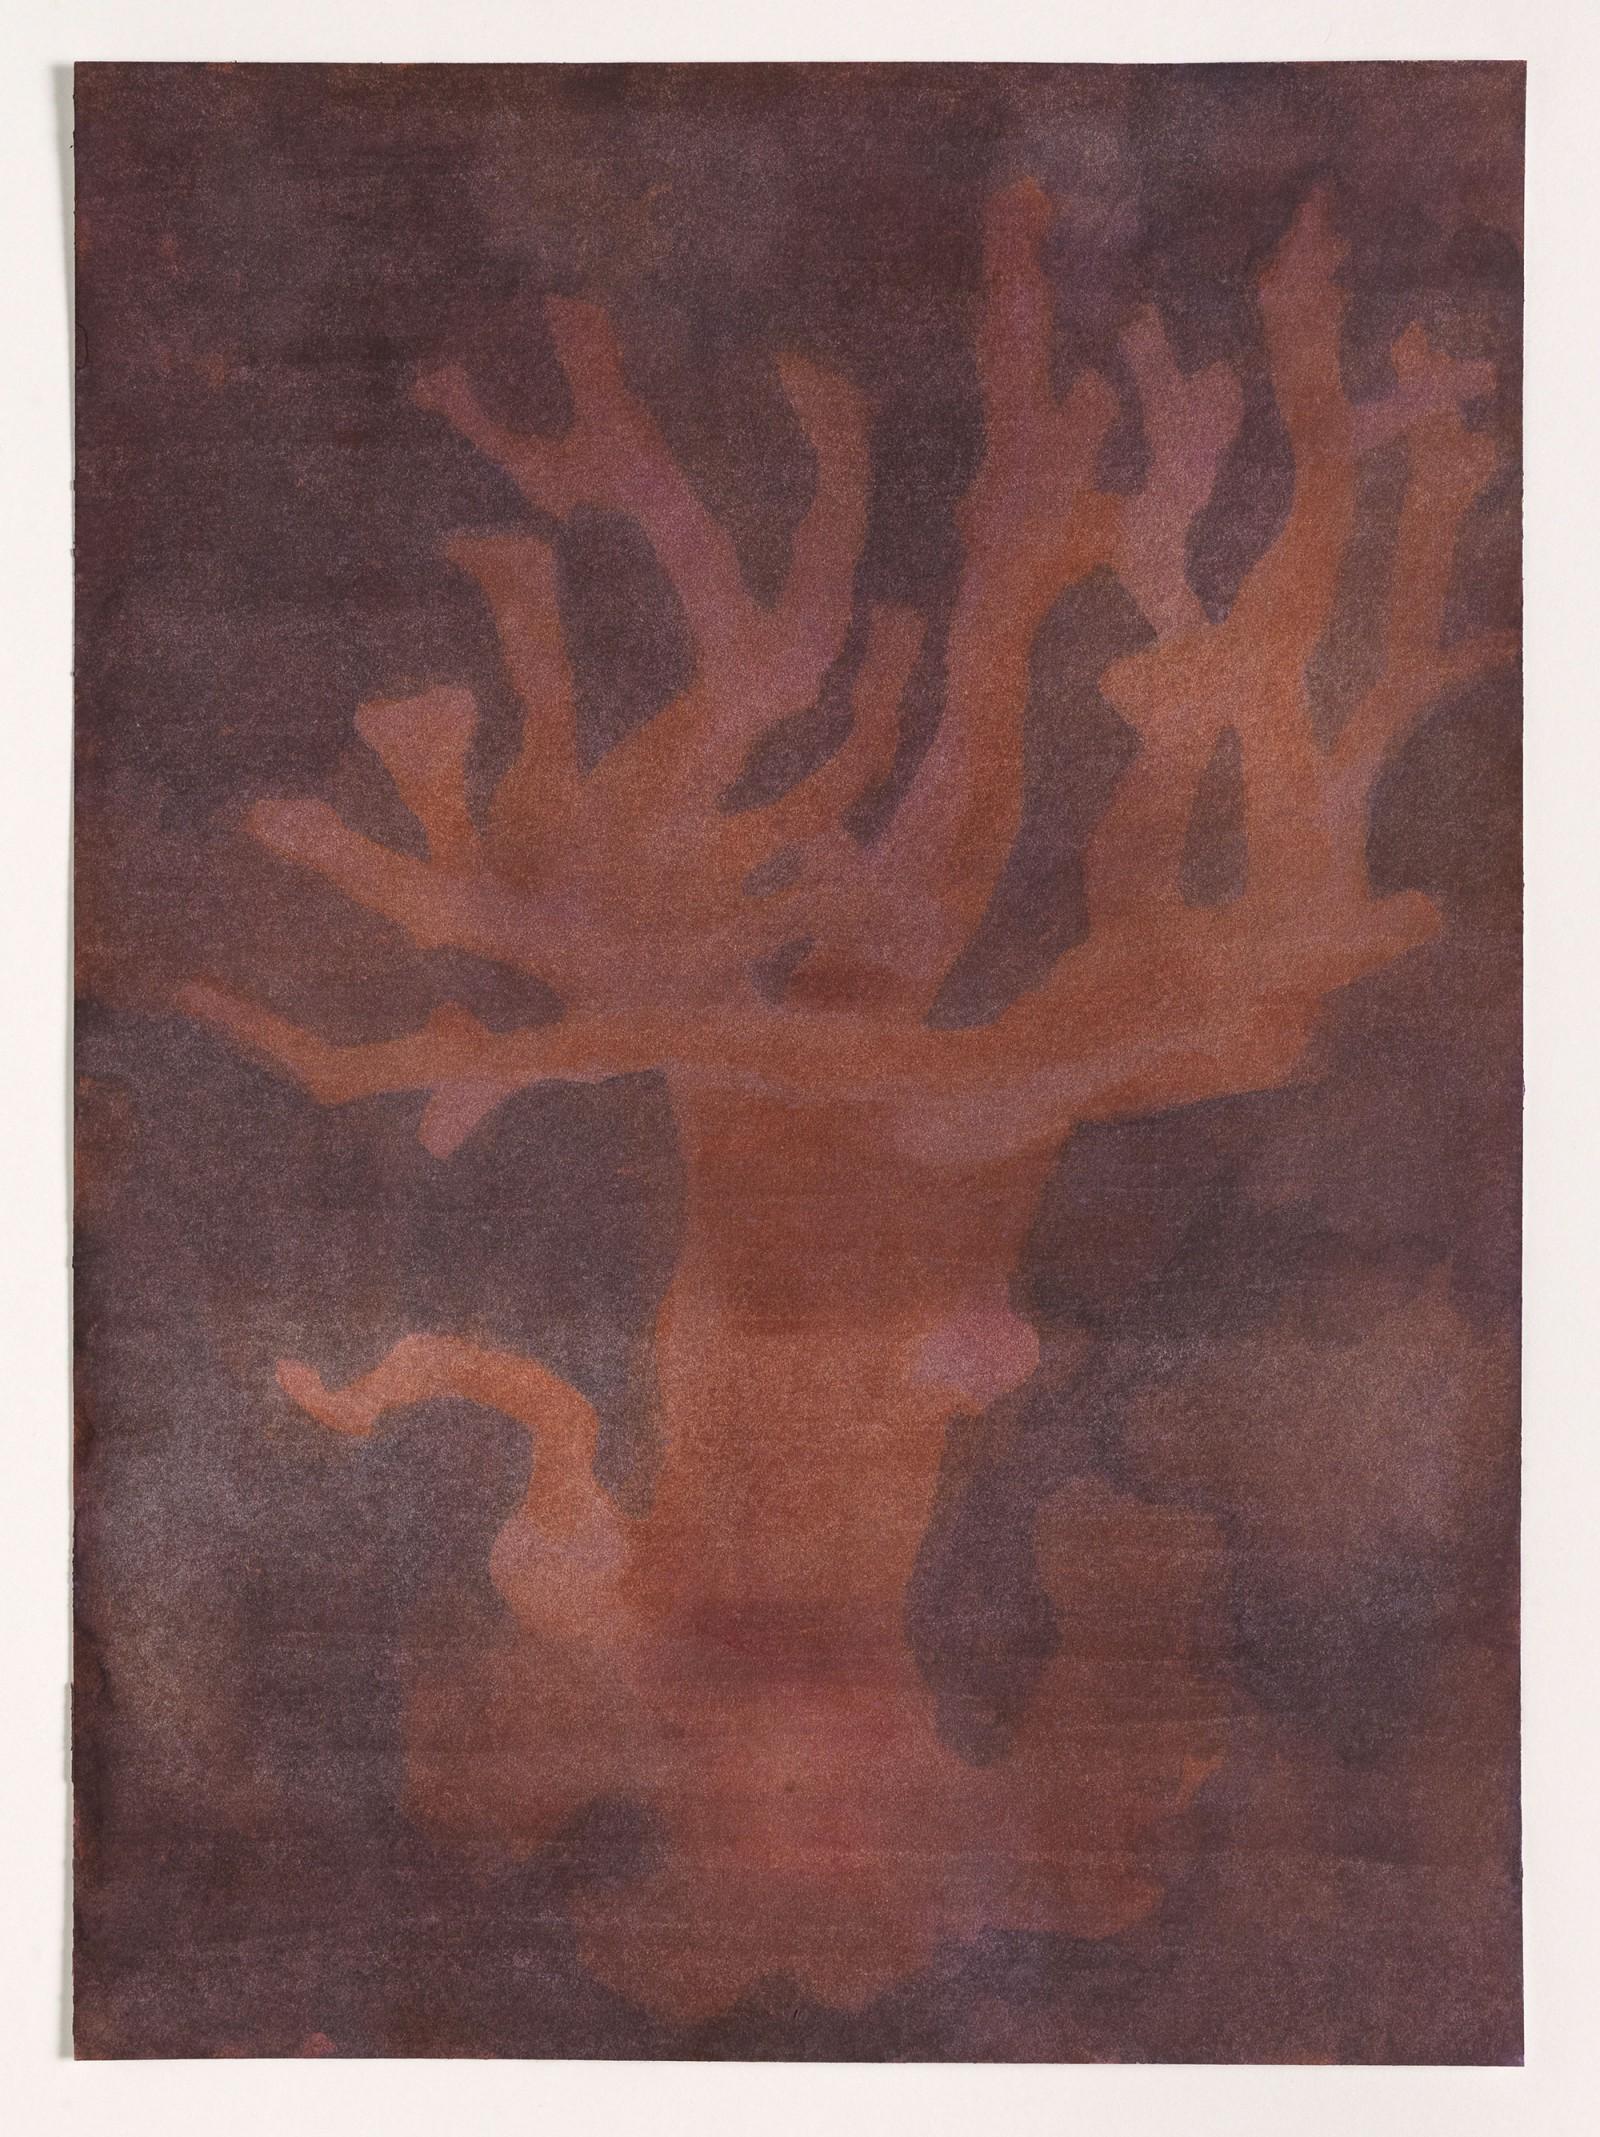 Kim Nekarda: untitled, 2014, watercolour on paper, 36 x 26 cm, private collection berlin